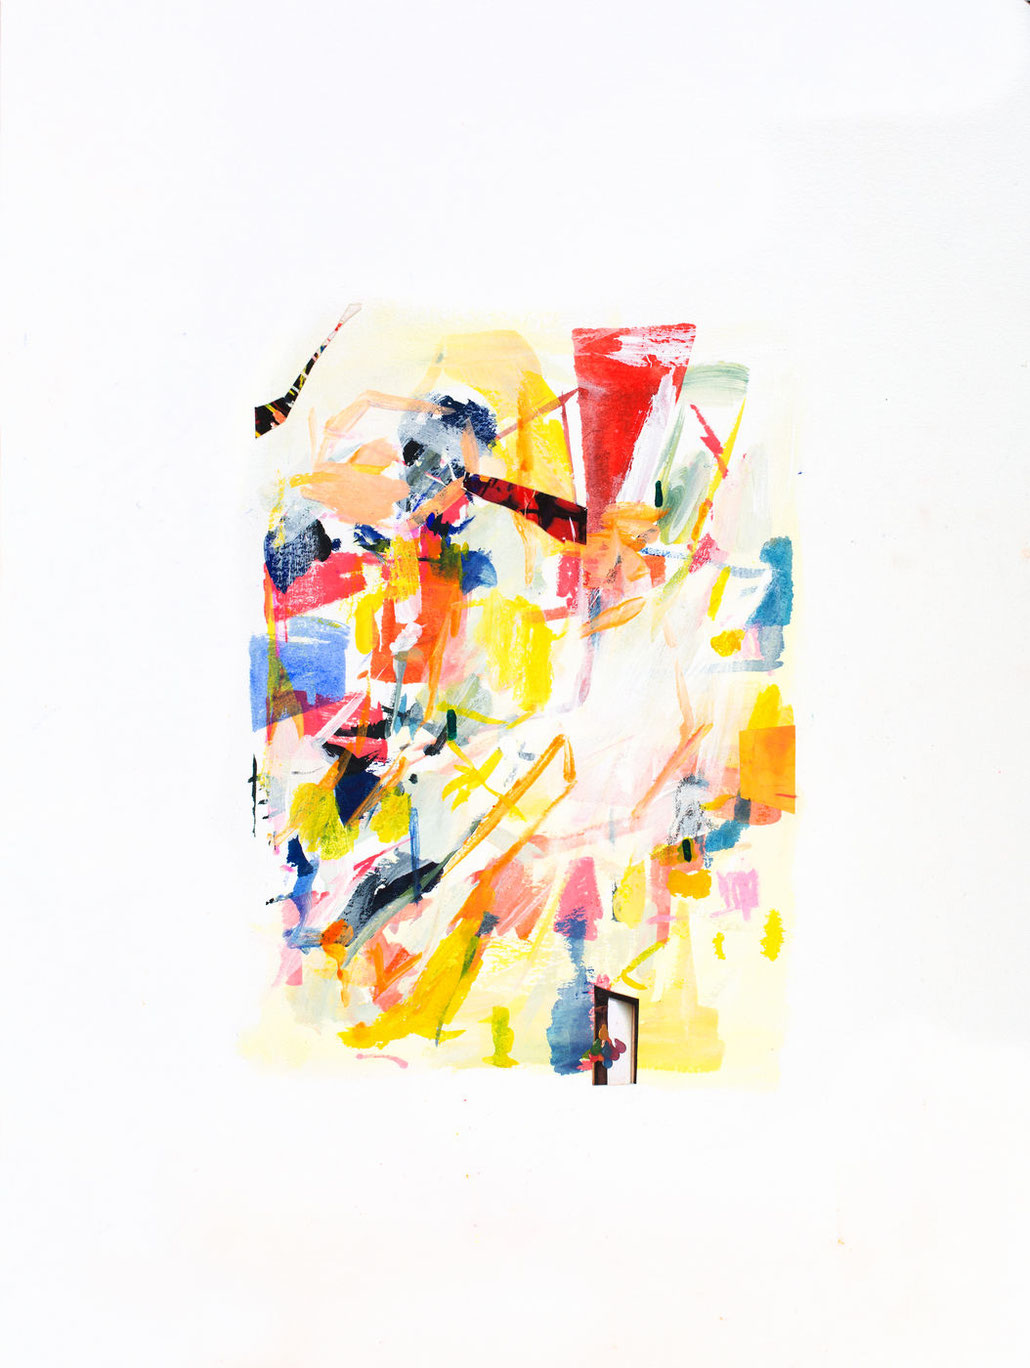 Stephanie de Voss artwork online shop